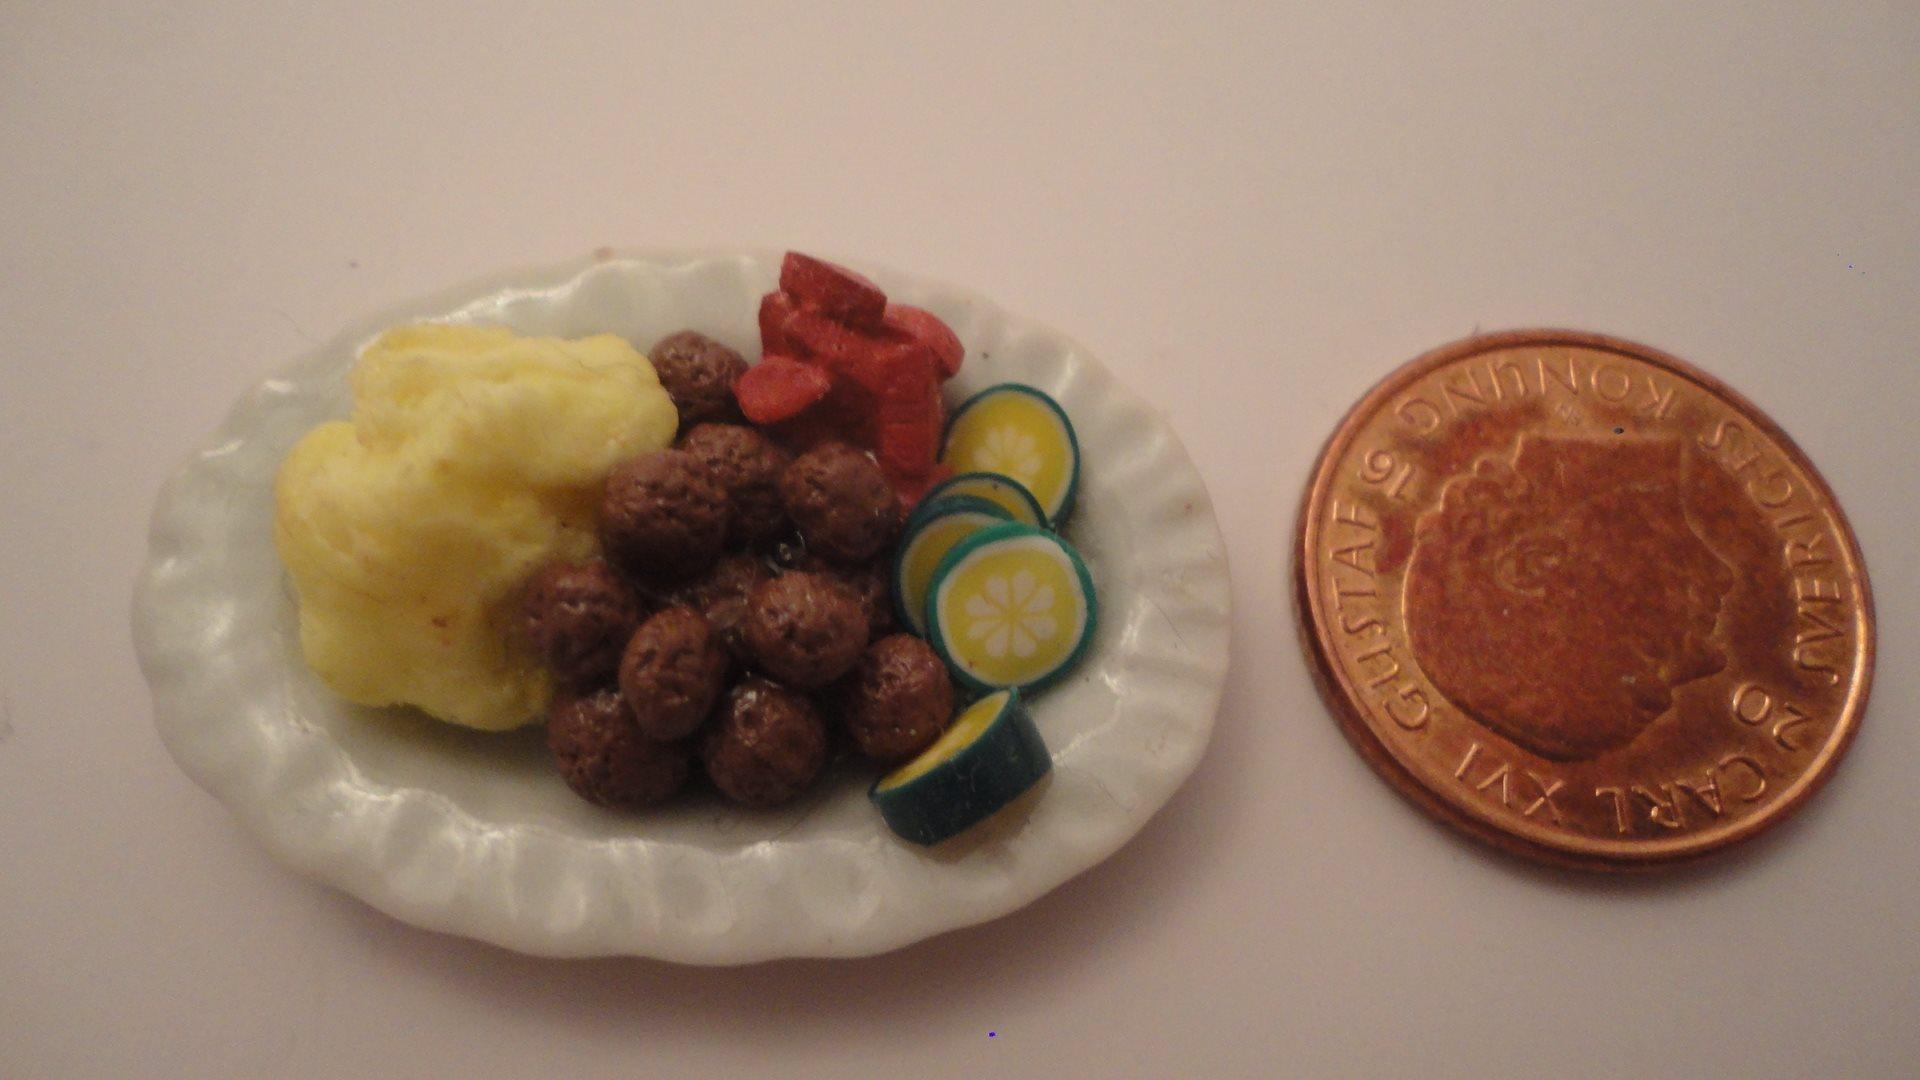 potatismos med skal